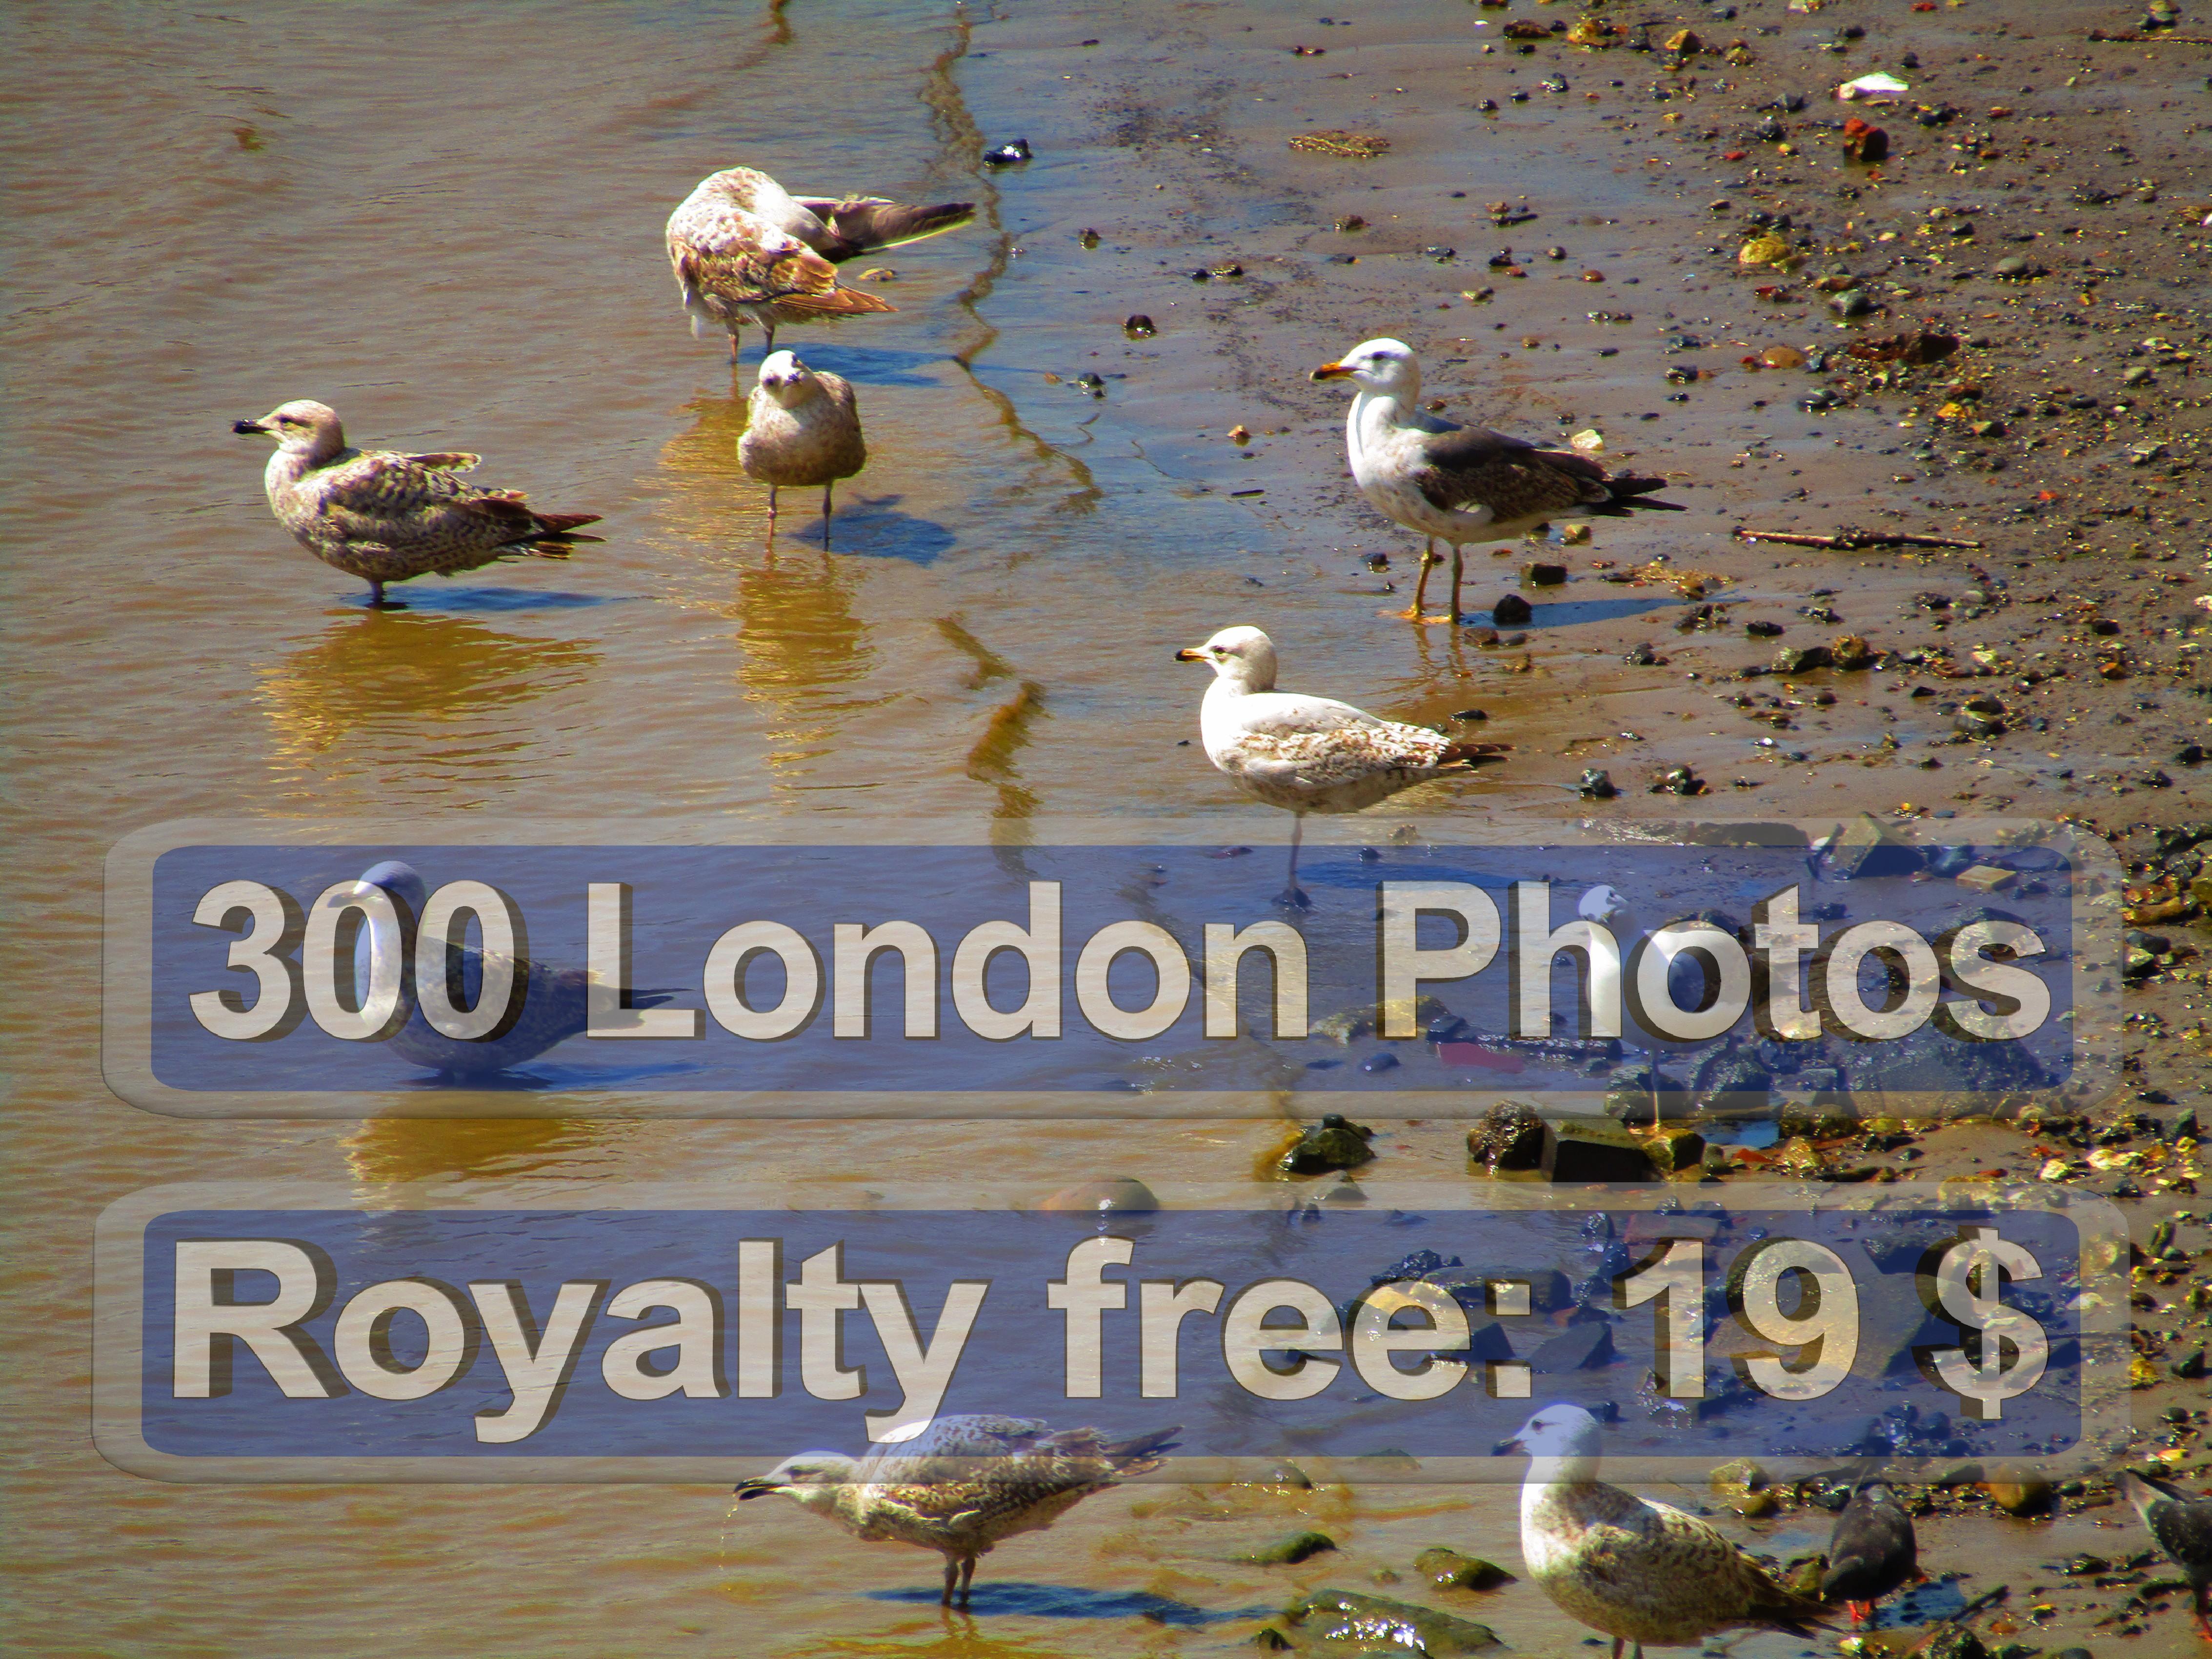 London Photo Galery